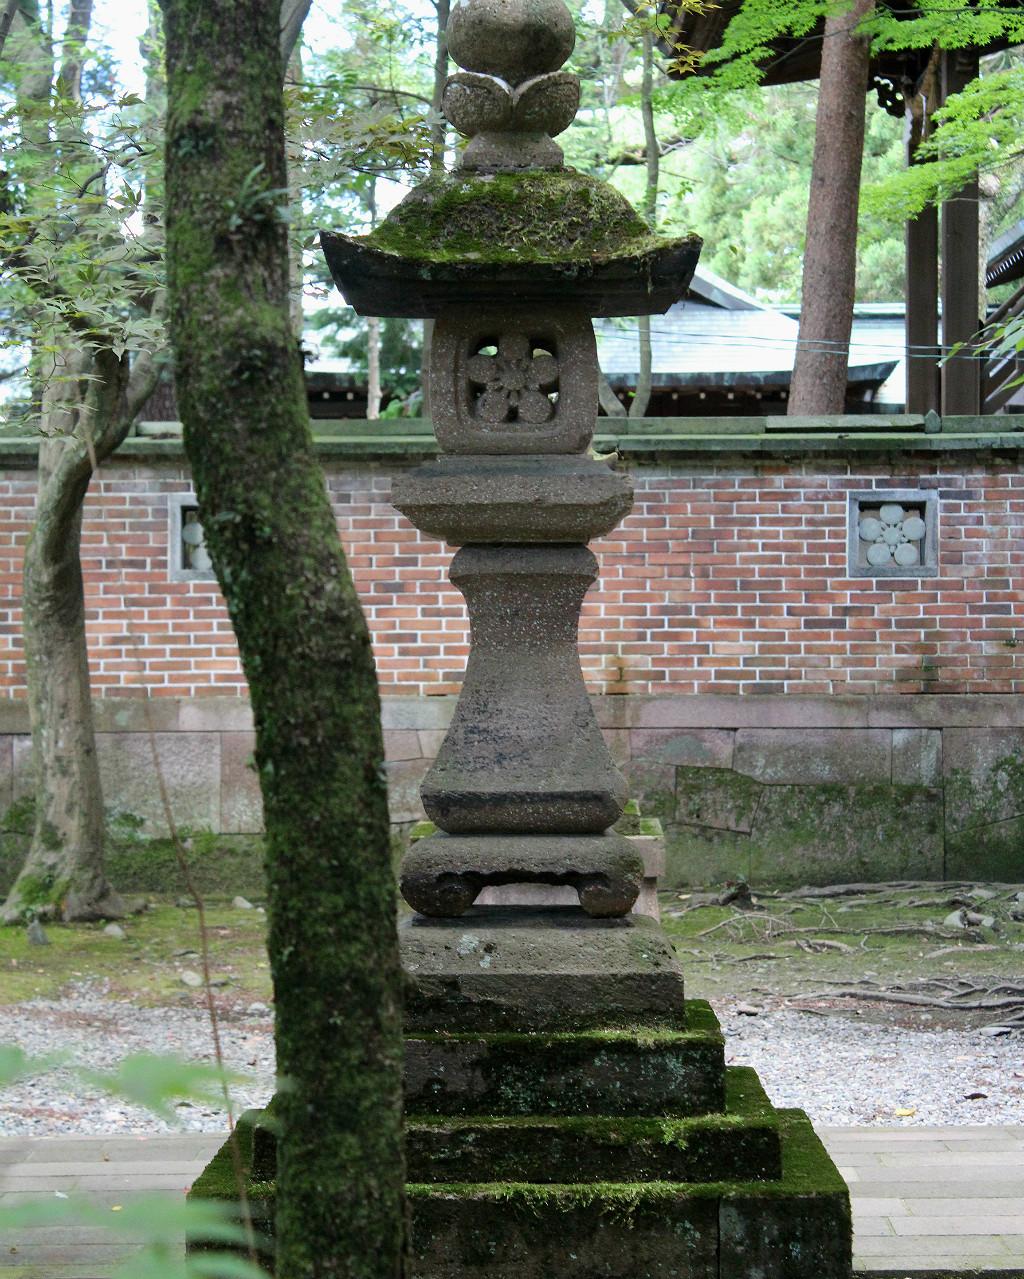 Lantern guiding the path to the secondary shrine at Oyama Shrine in Kanazawa, Japan